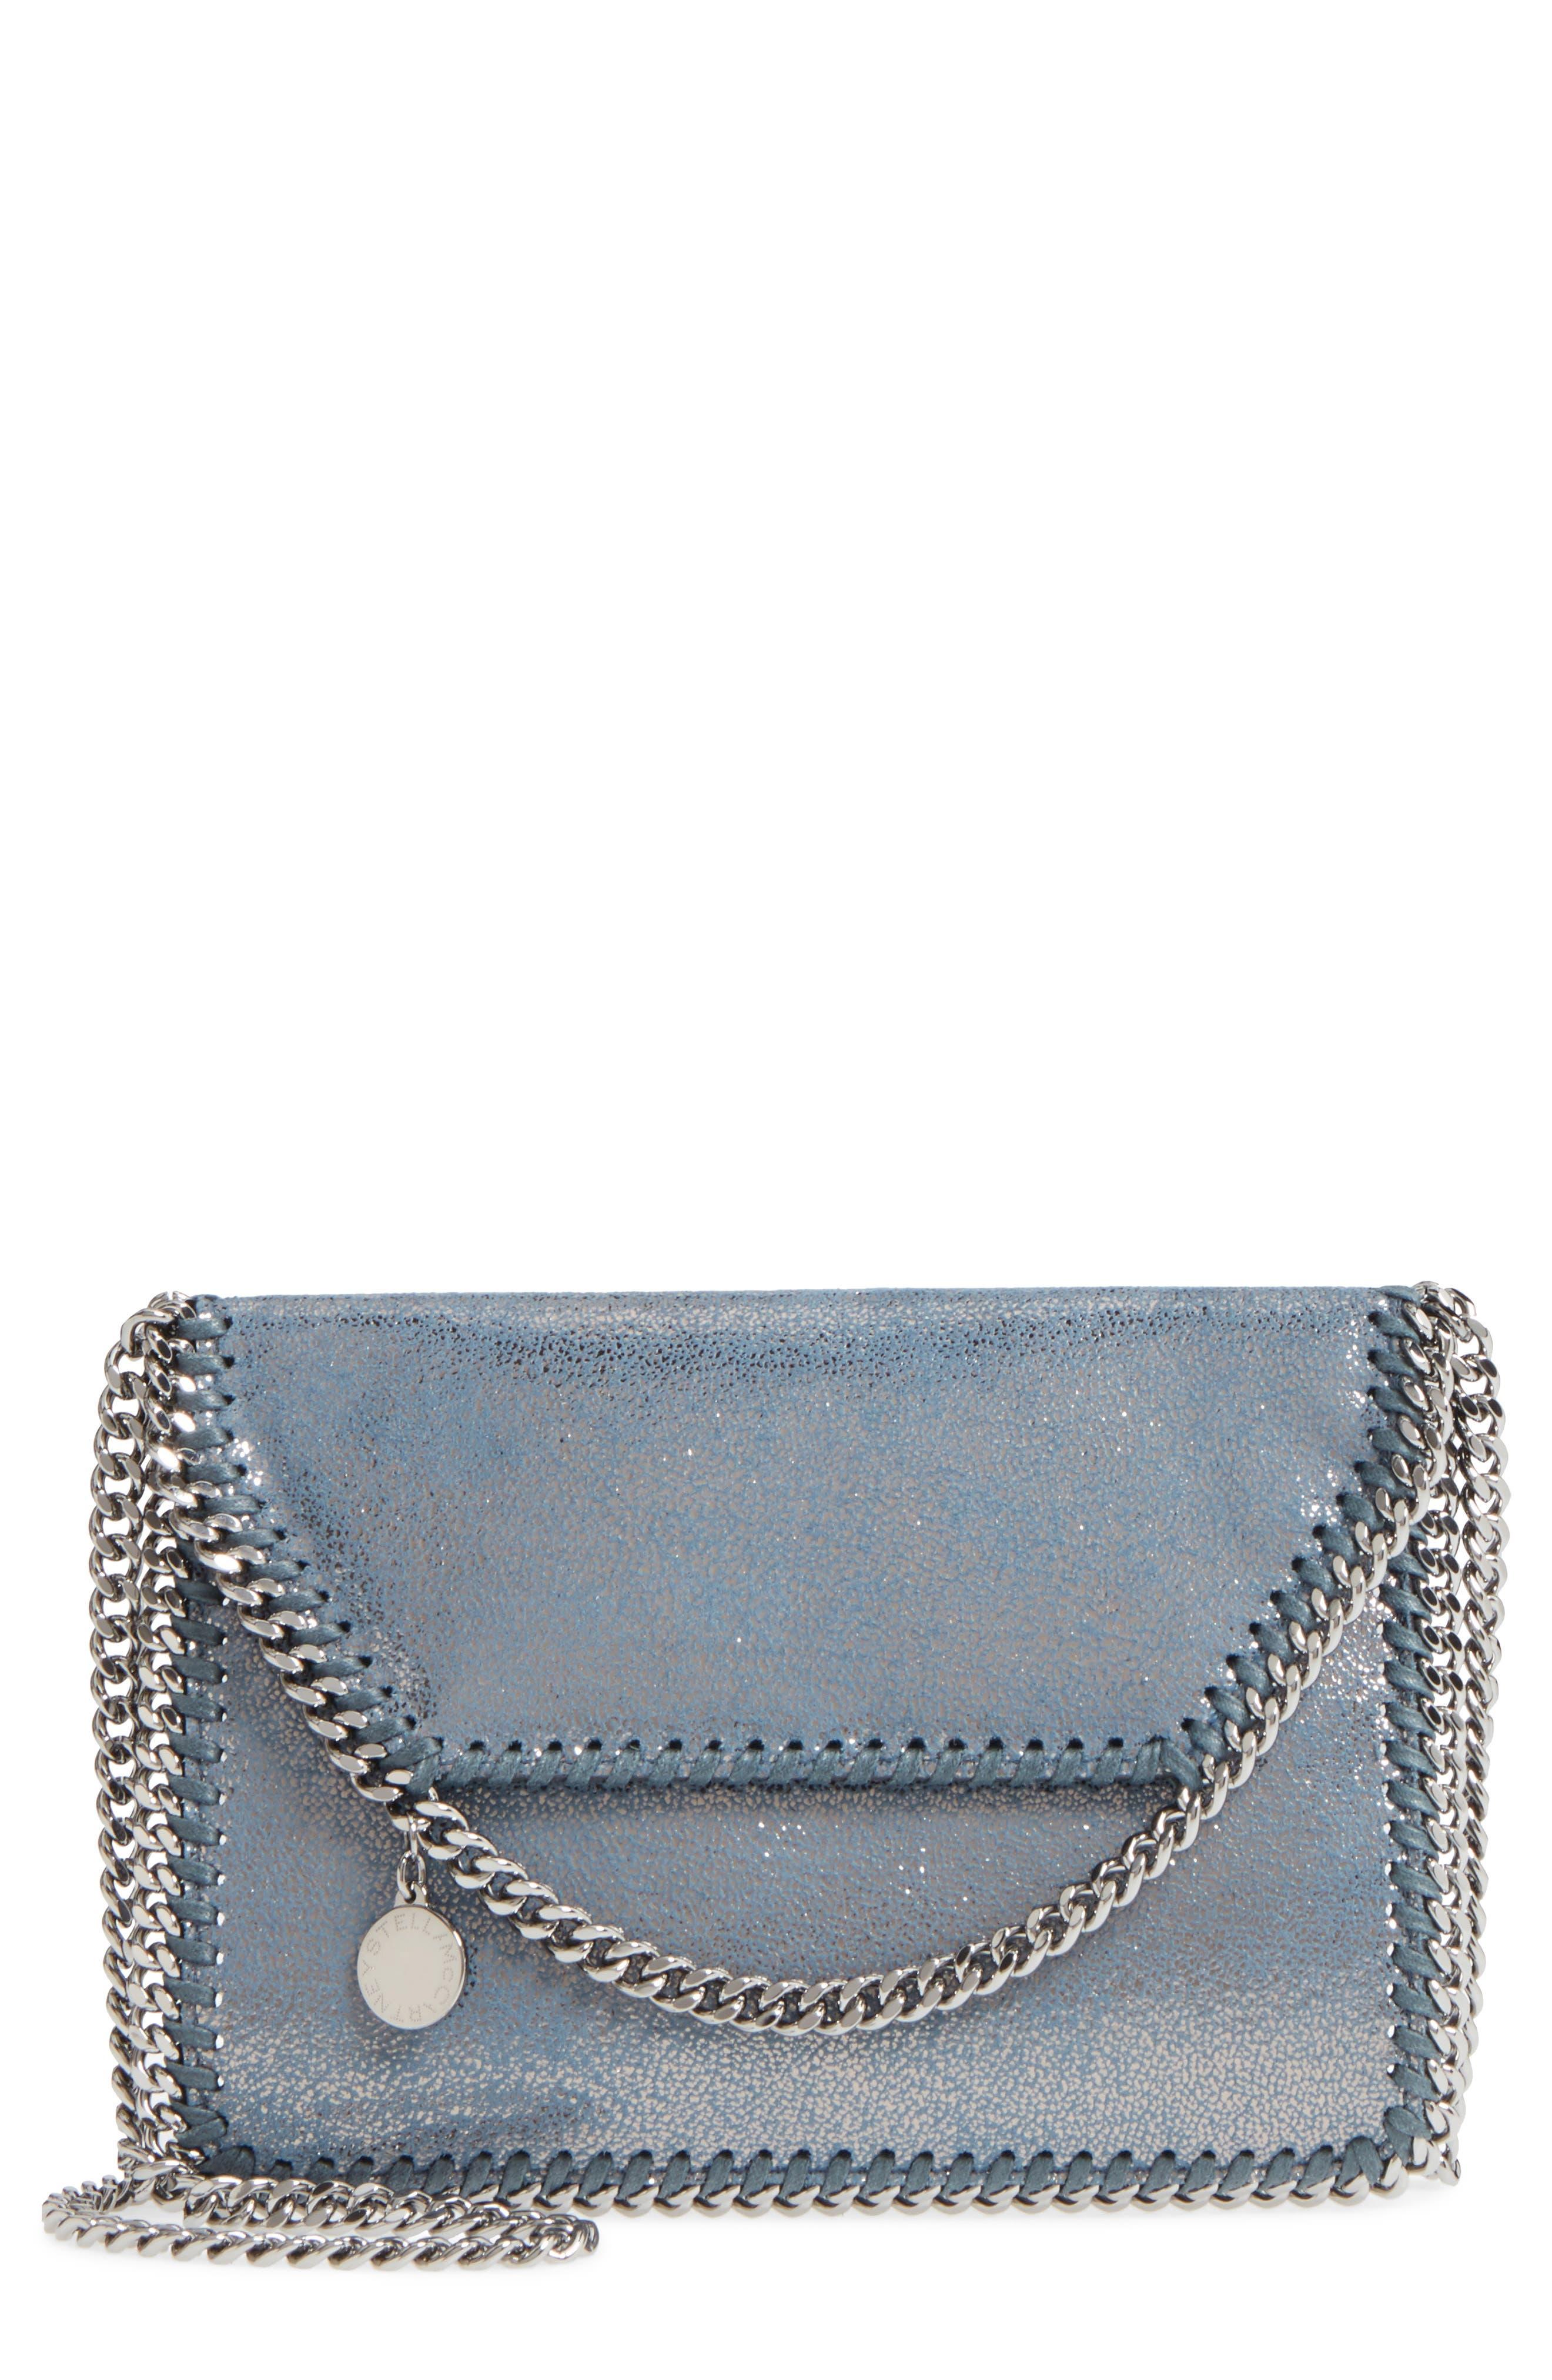 Stella McCartney Metallic Faux Leather Crossbody Bag